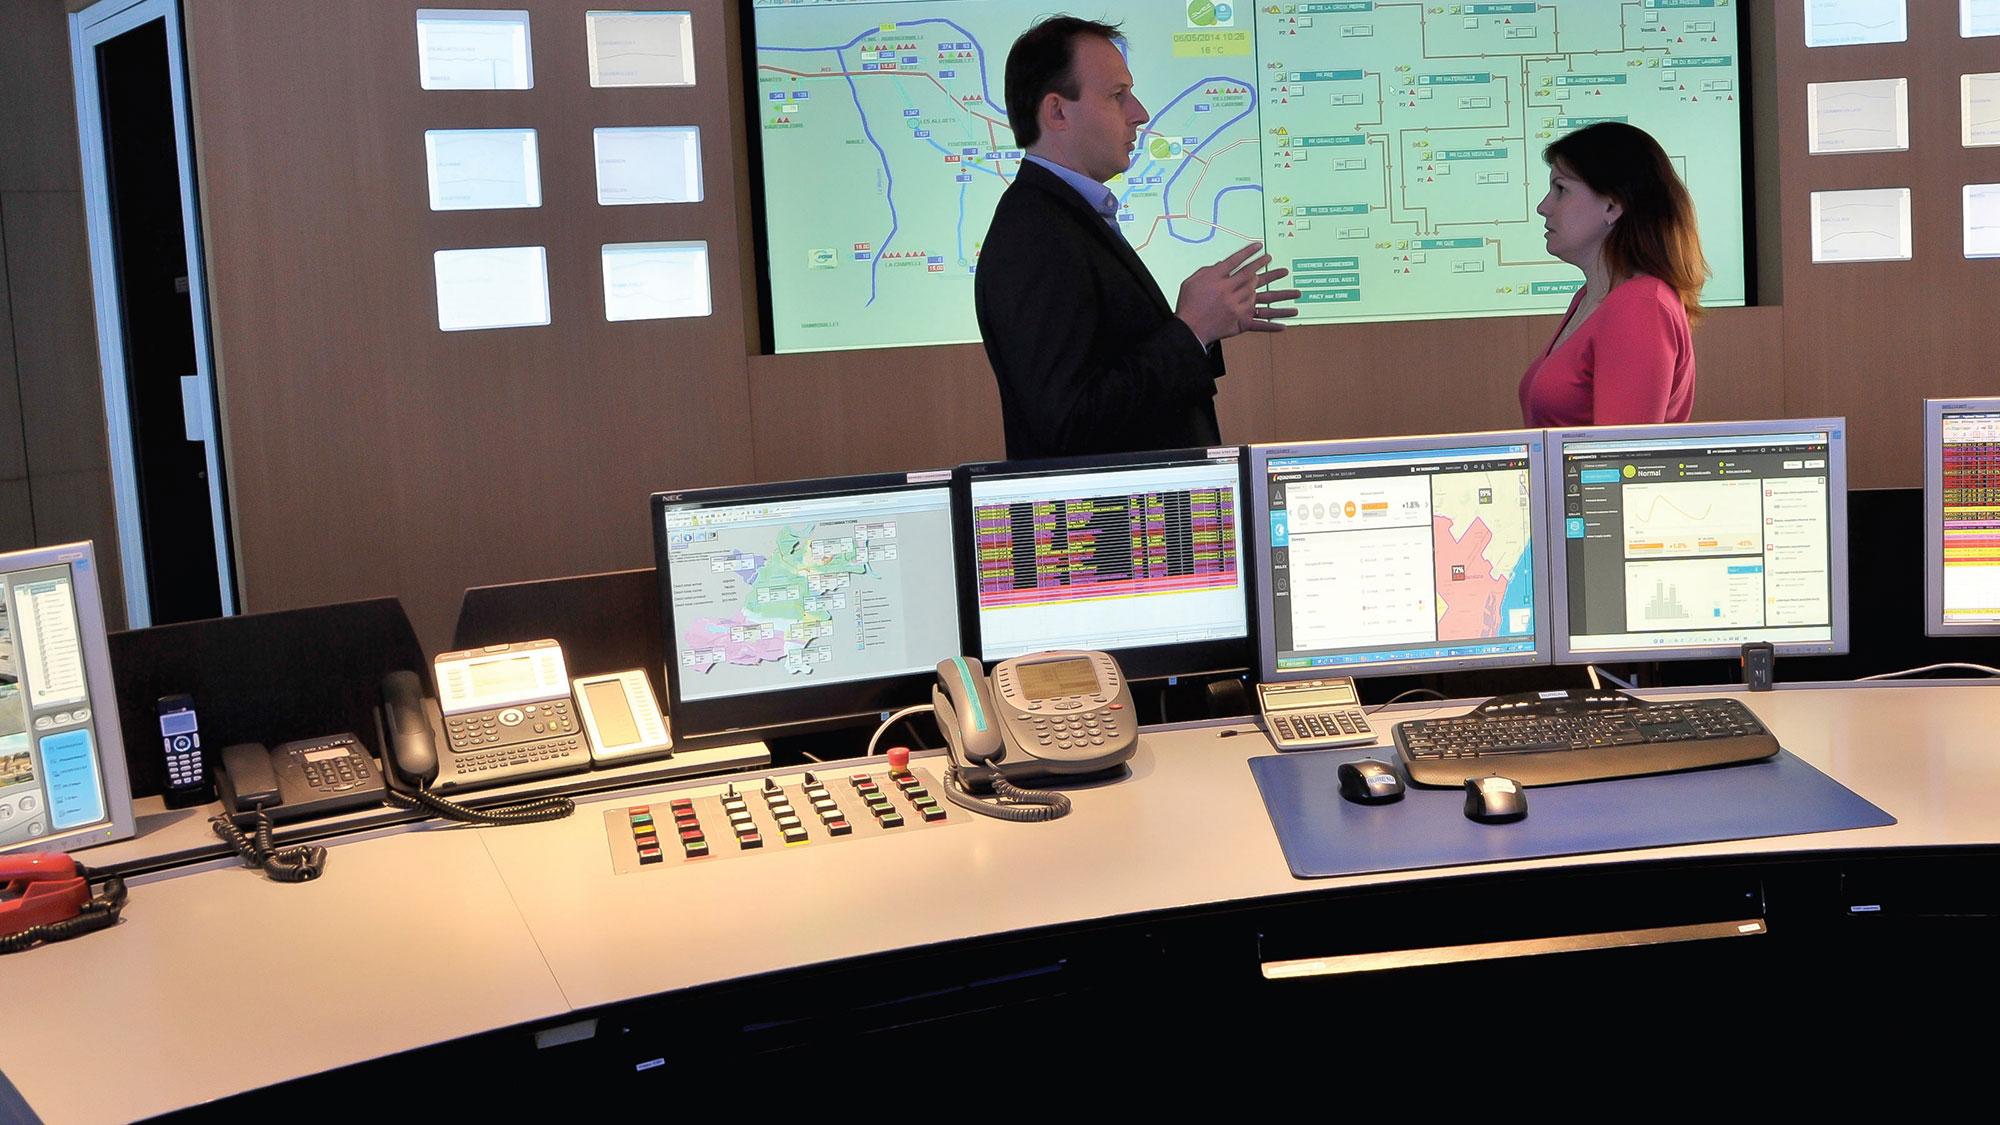 Smart control centers